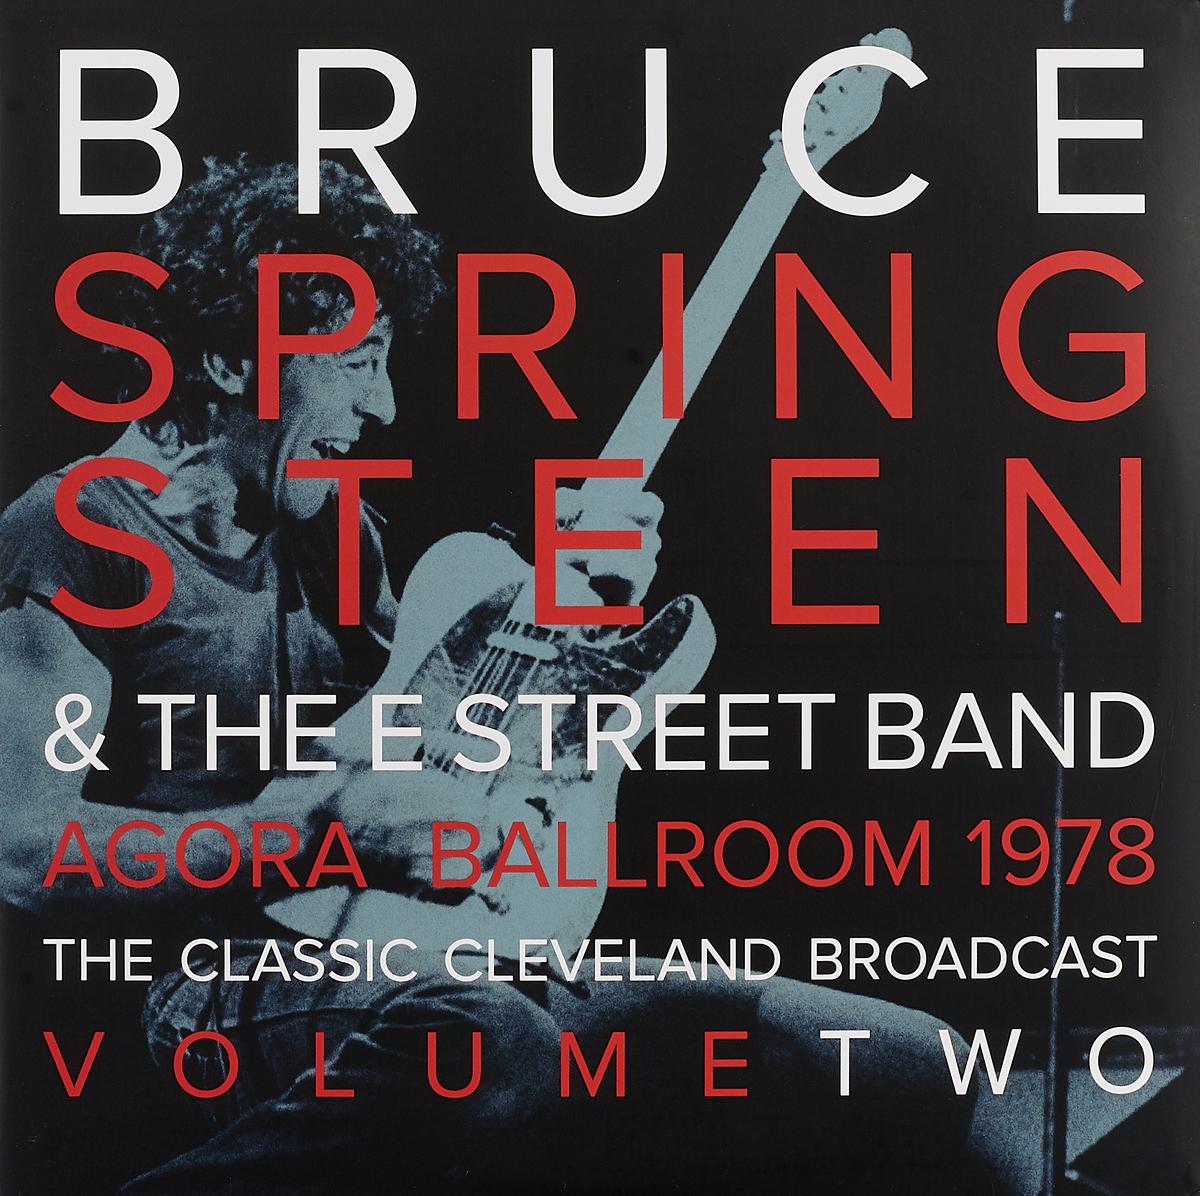 Брюс Спрингстин Bruce Springsteen & The E-Street Band. Agora Ballroom 1978 - The Classic Cleveland Broadcast Volume Two (2 LP) брюс спрингстин bruce springsteen passaic night 1978 the classic new jersey broadcast volume two 2 lp